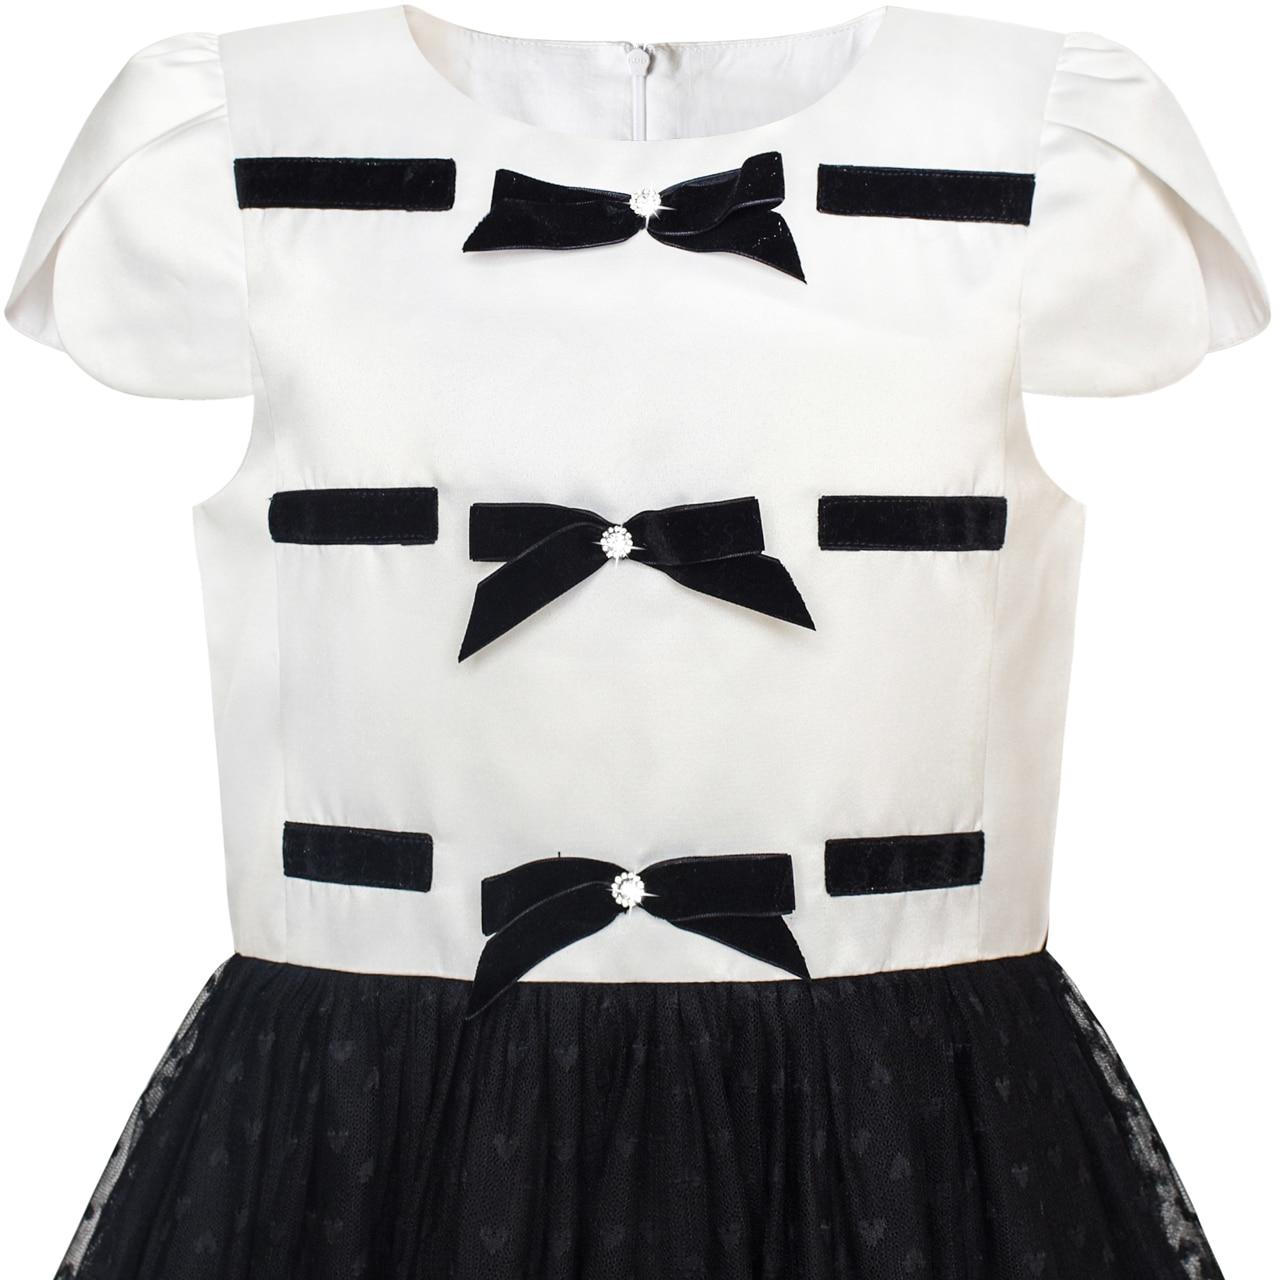 9a208496ecde3 US $20.39 49% OFF Girls Dress Back School Black White Bow Tie School  Uniform 2018 Summer Princess Wedding Party Dresses Children Clothes Size 6  12-in ...